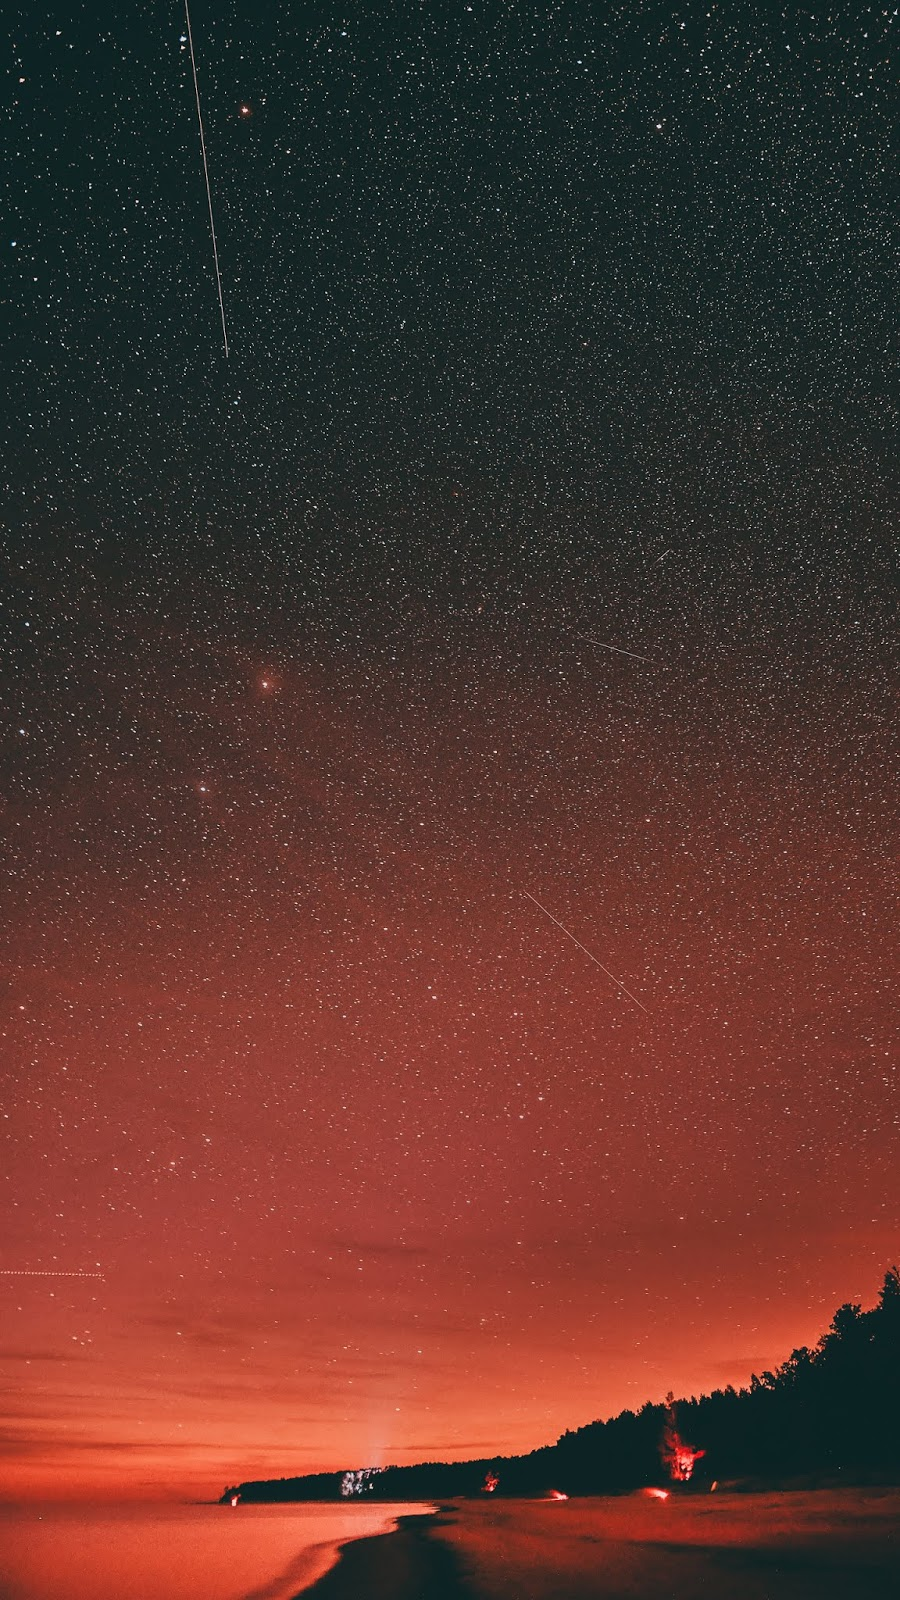 Red starry night